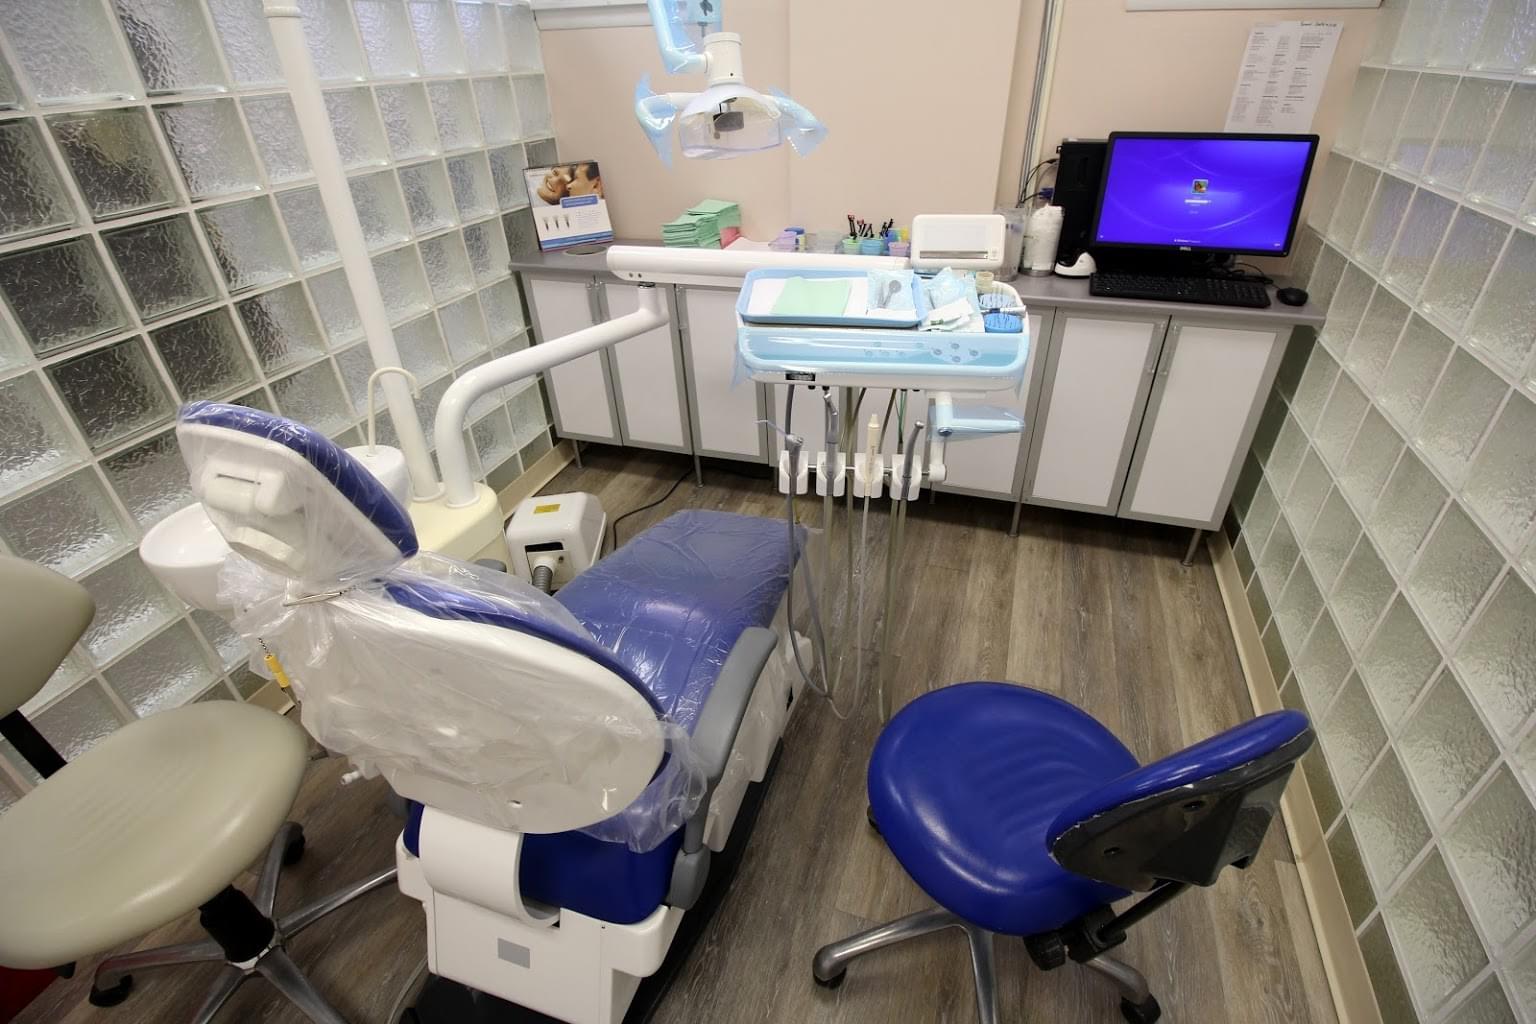 Signature Smiles Dental Office in Bristol, PA dentist chair exam room